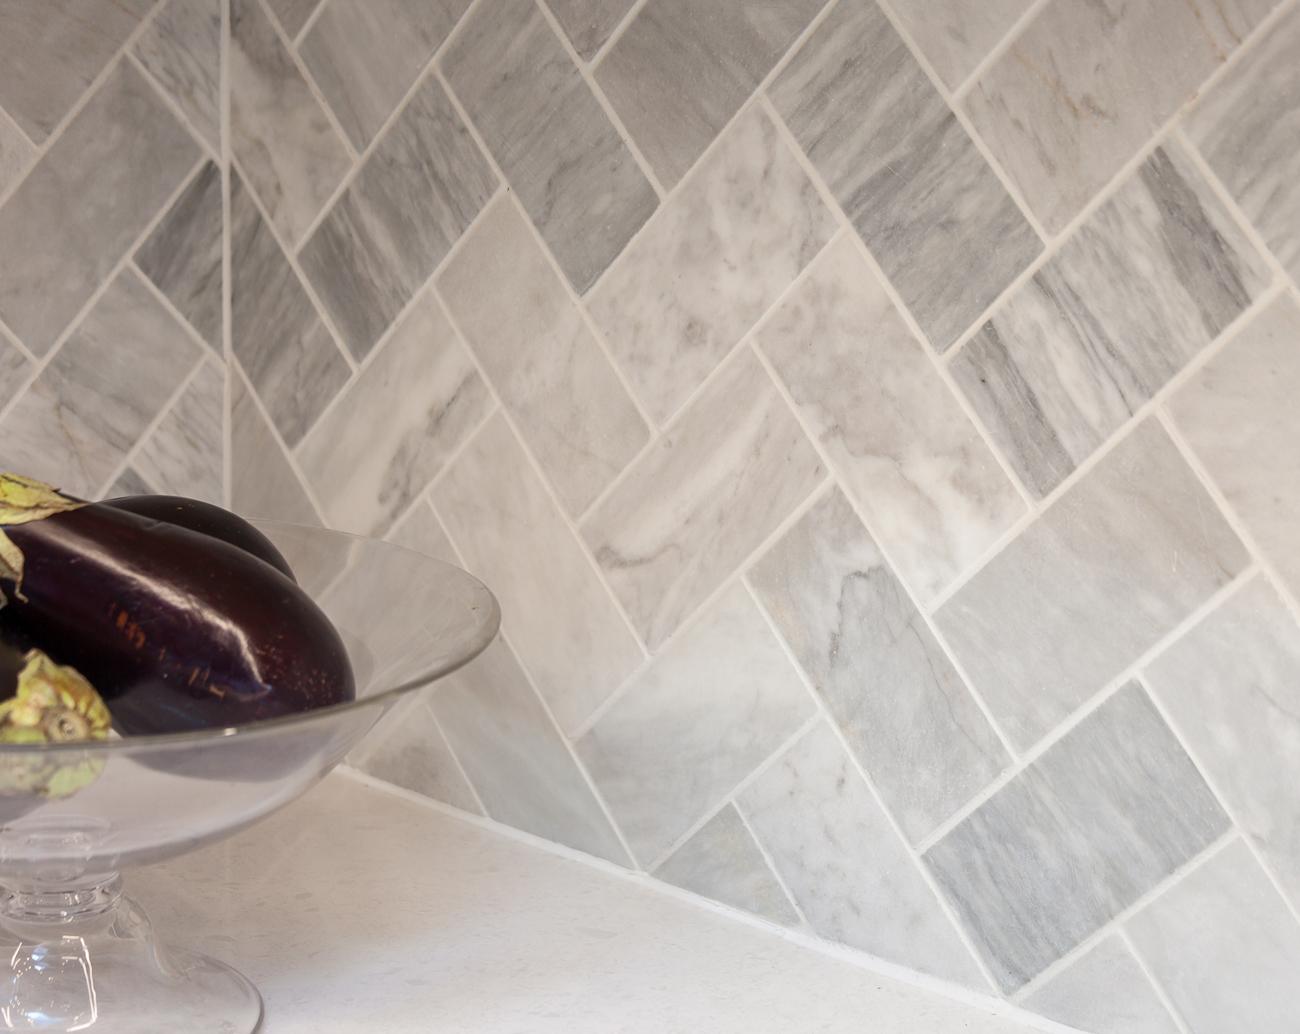 Bianco Venatino 3x6 Hone Carrera Marble, Installed in a Herringbone pattern